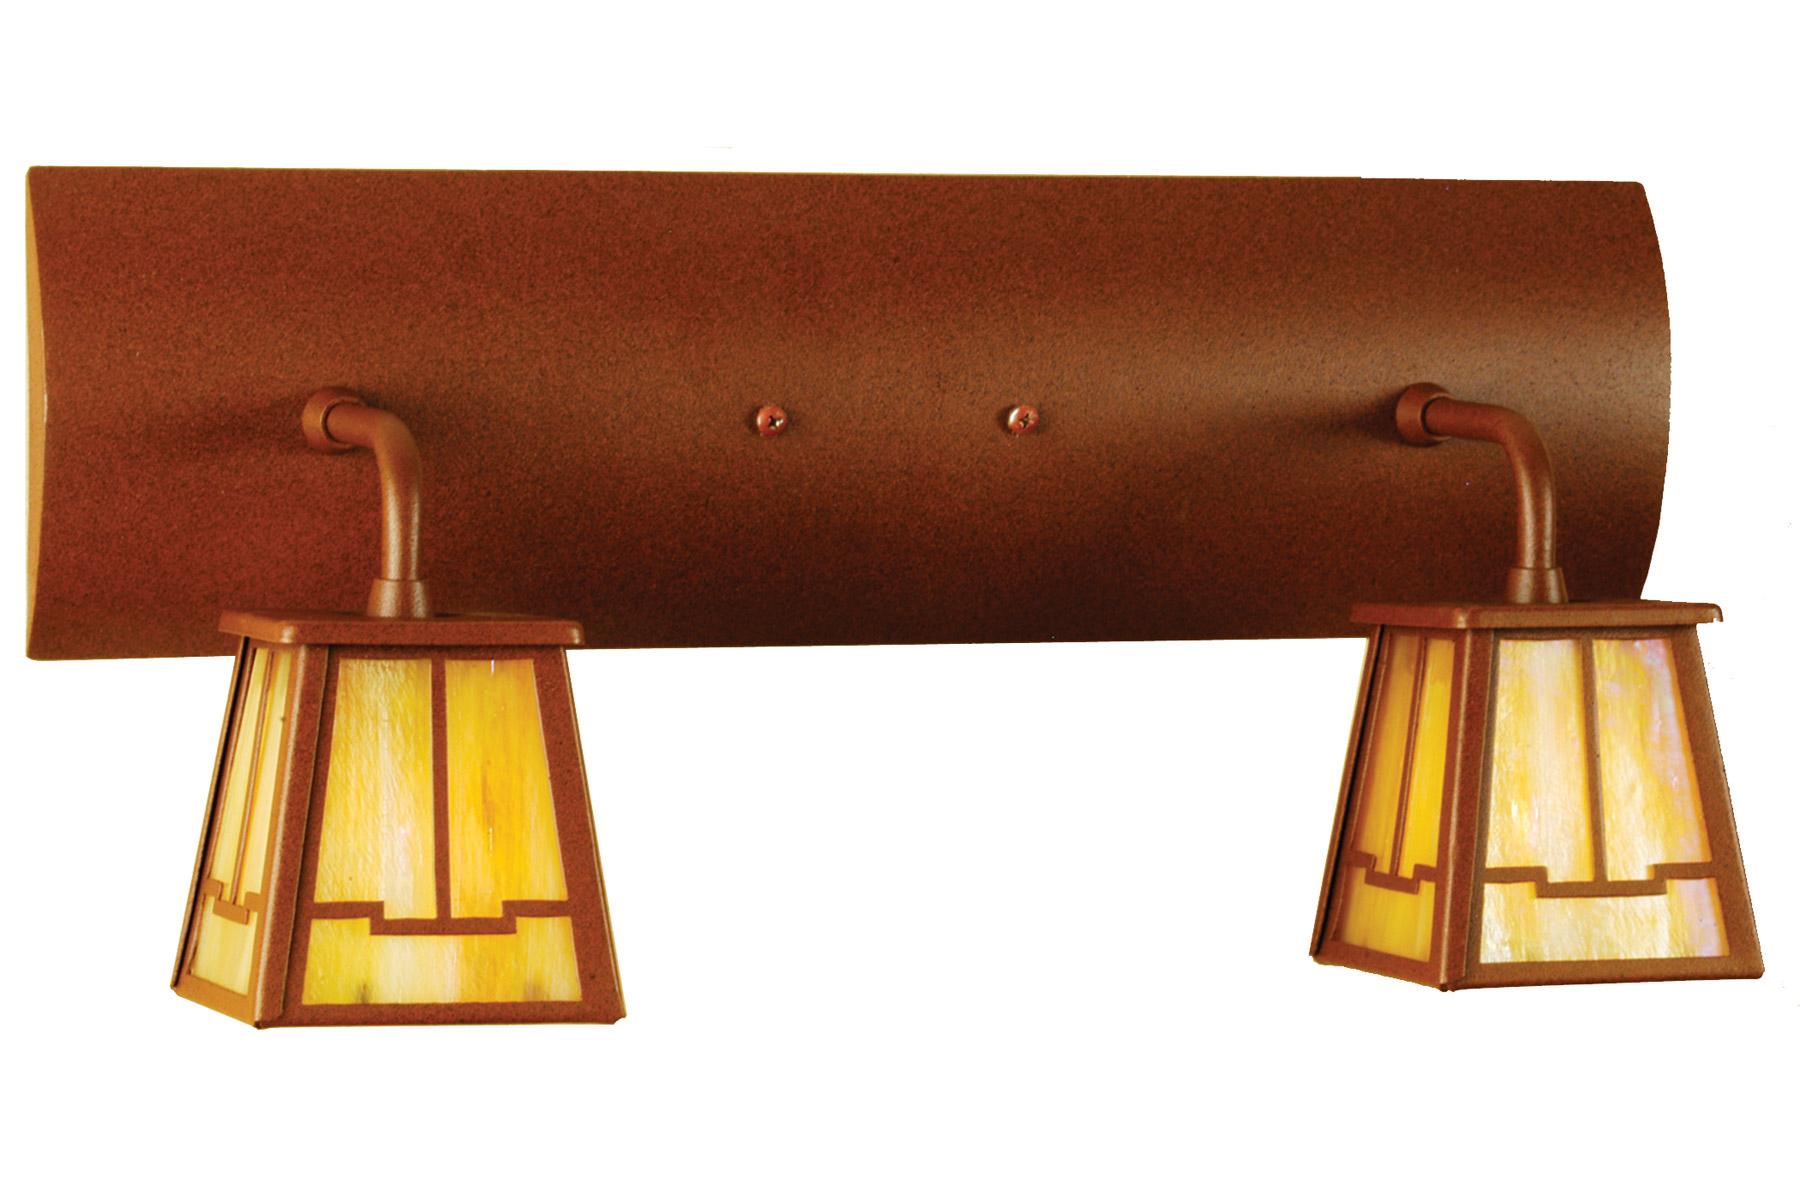 Craftsman Style Bathroom Lighting : Meyda bungalow valley view vanity light